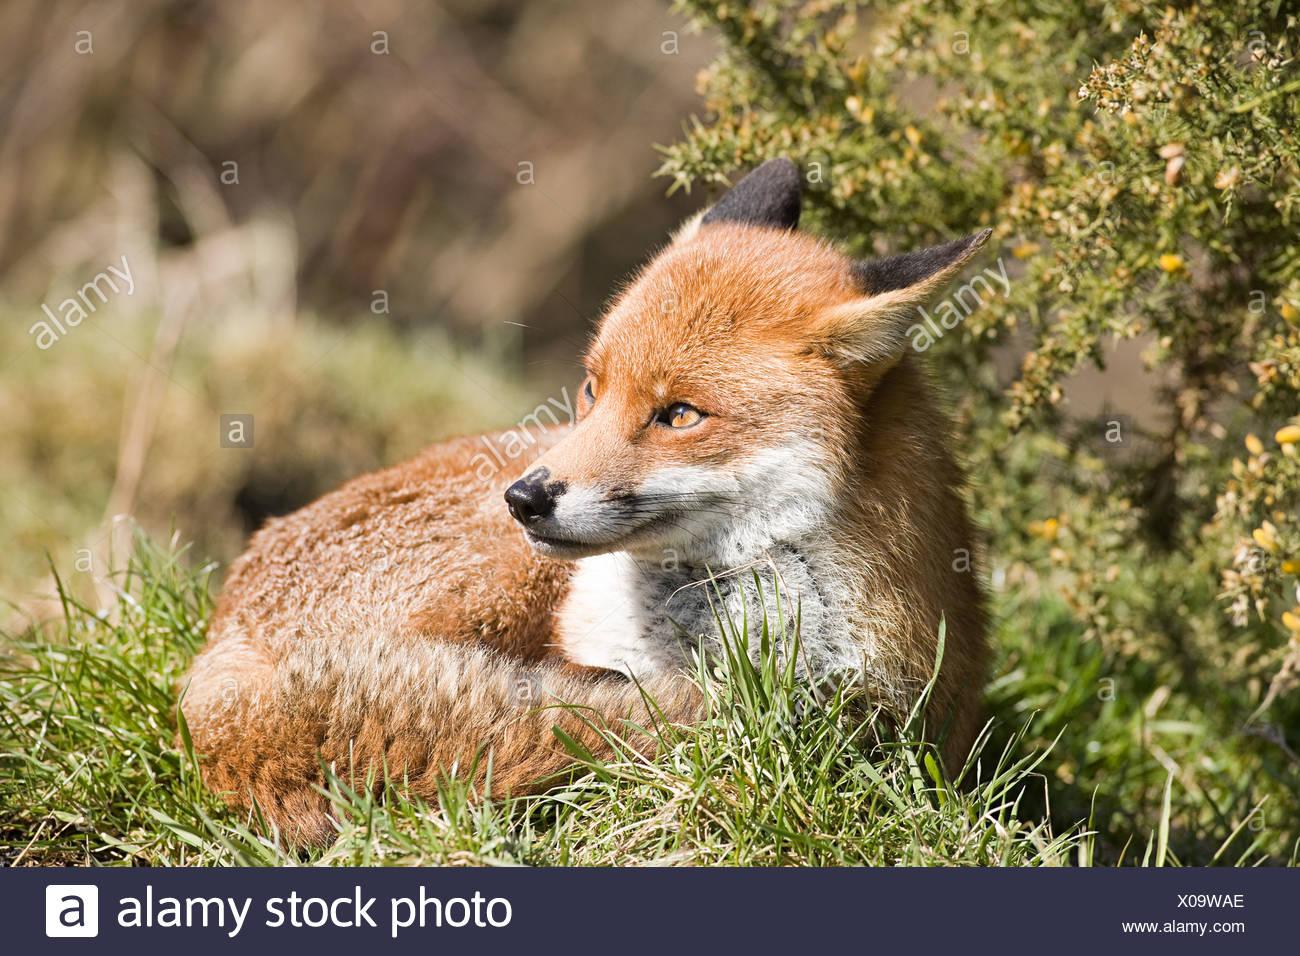 Red fox - Stock Image